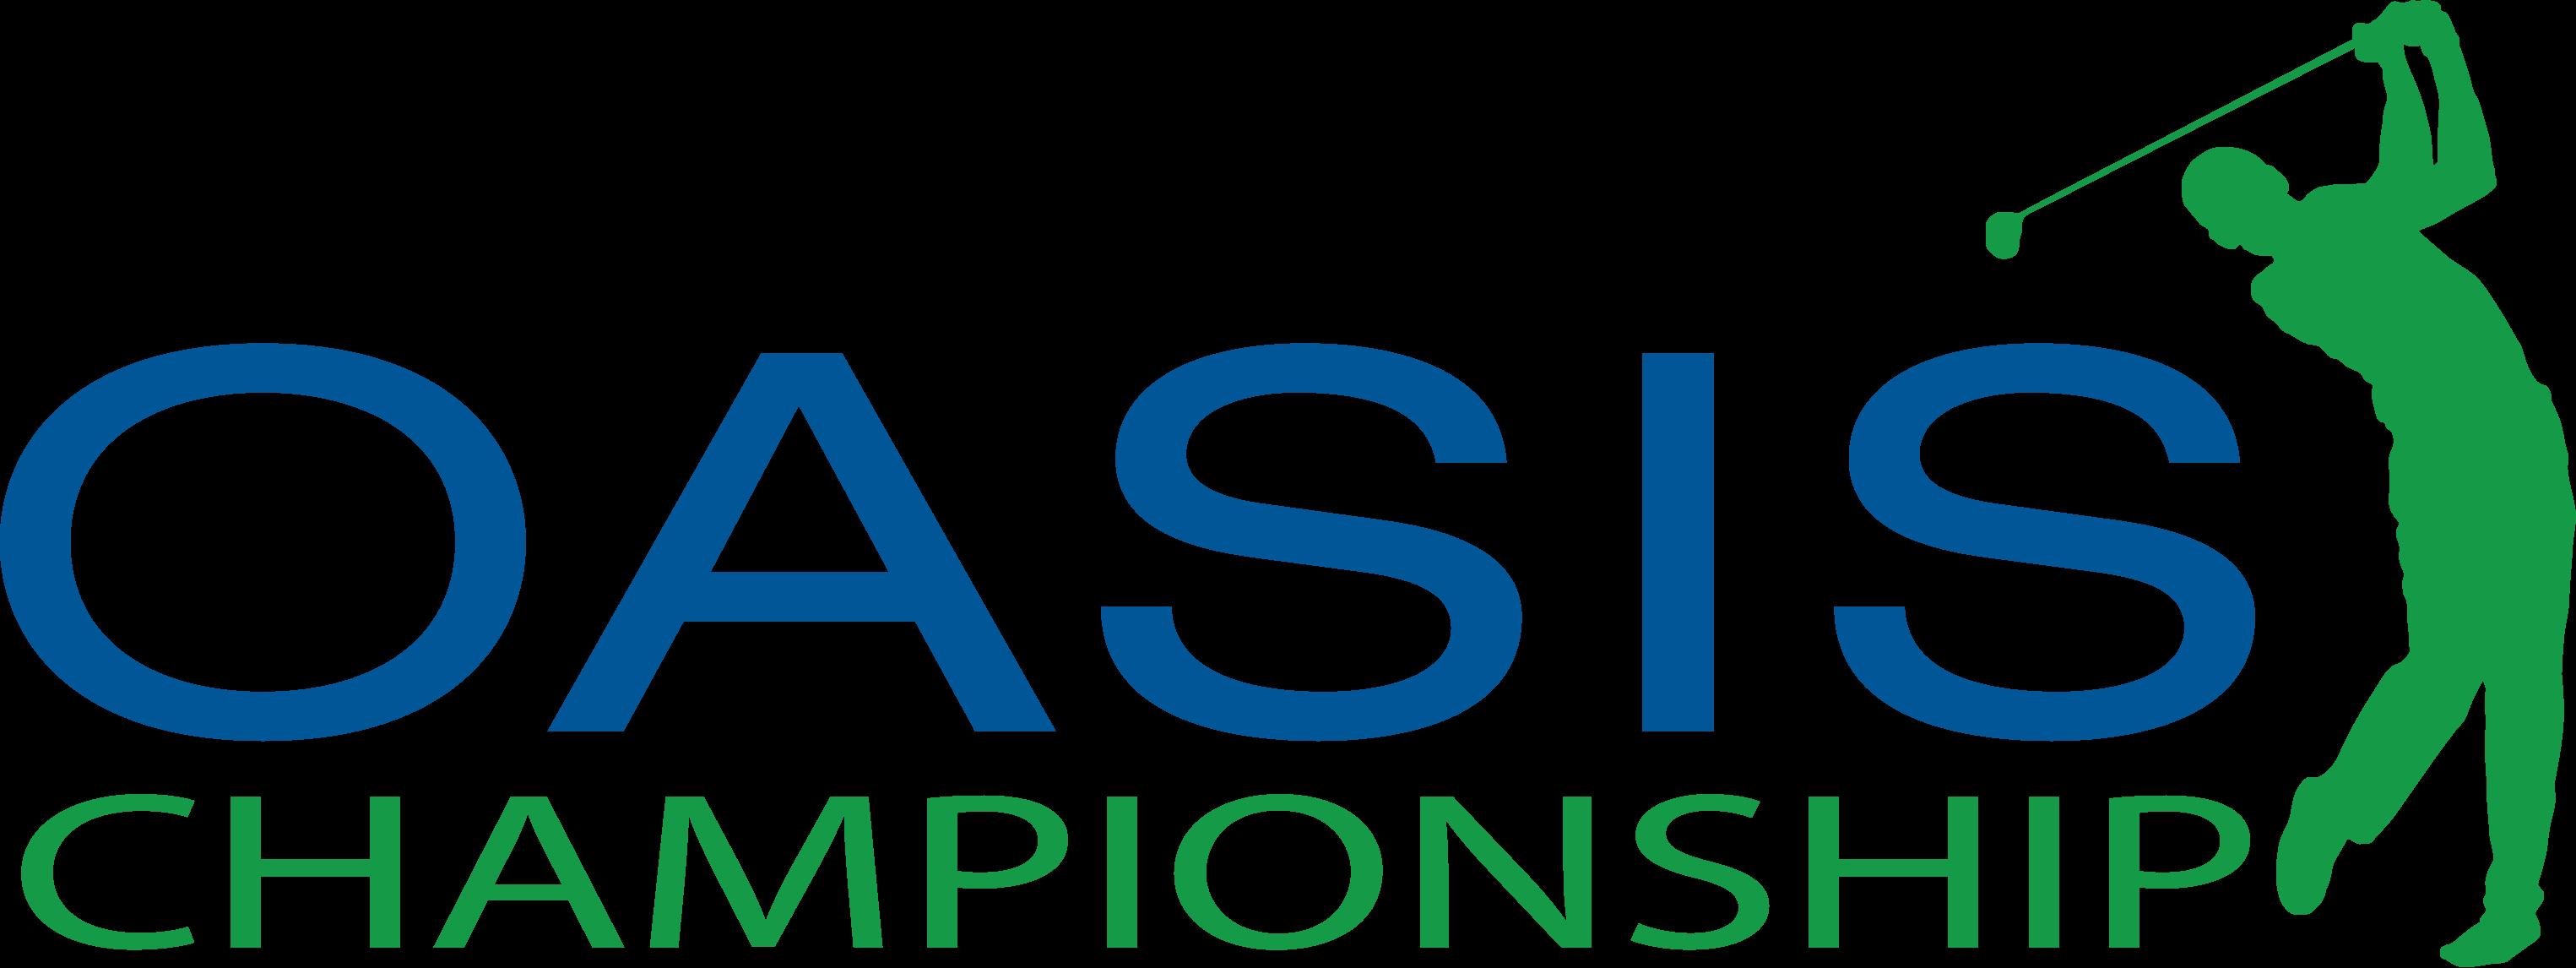 Oasis Championship